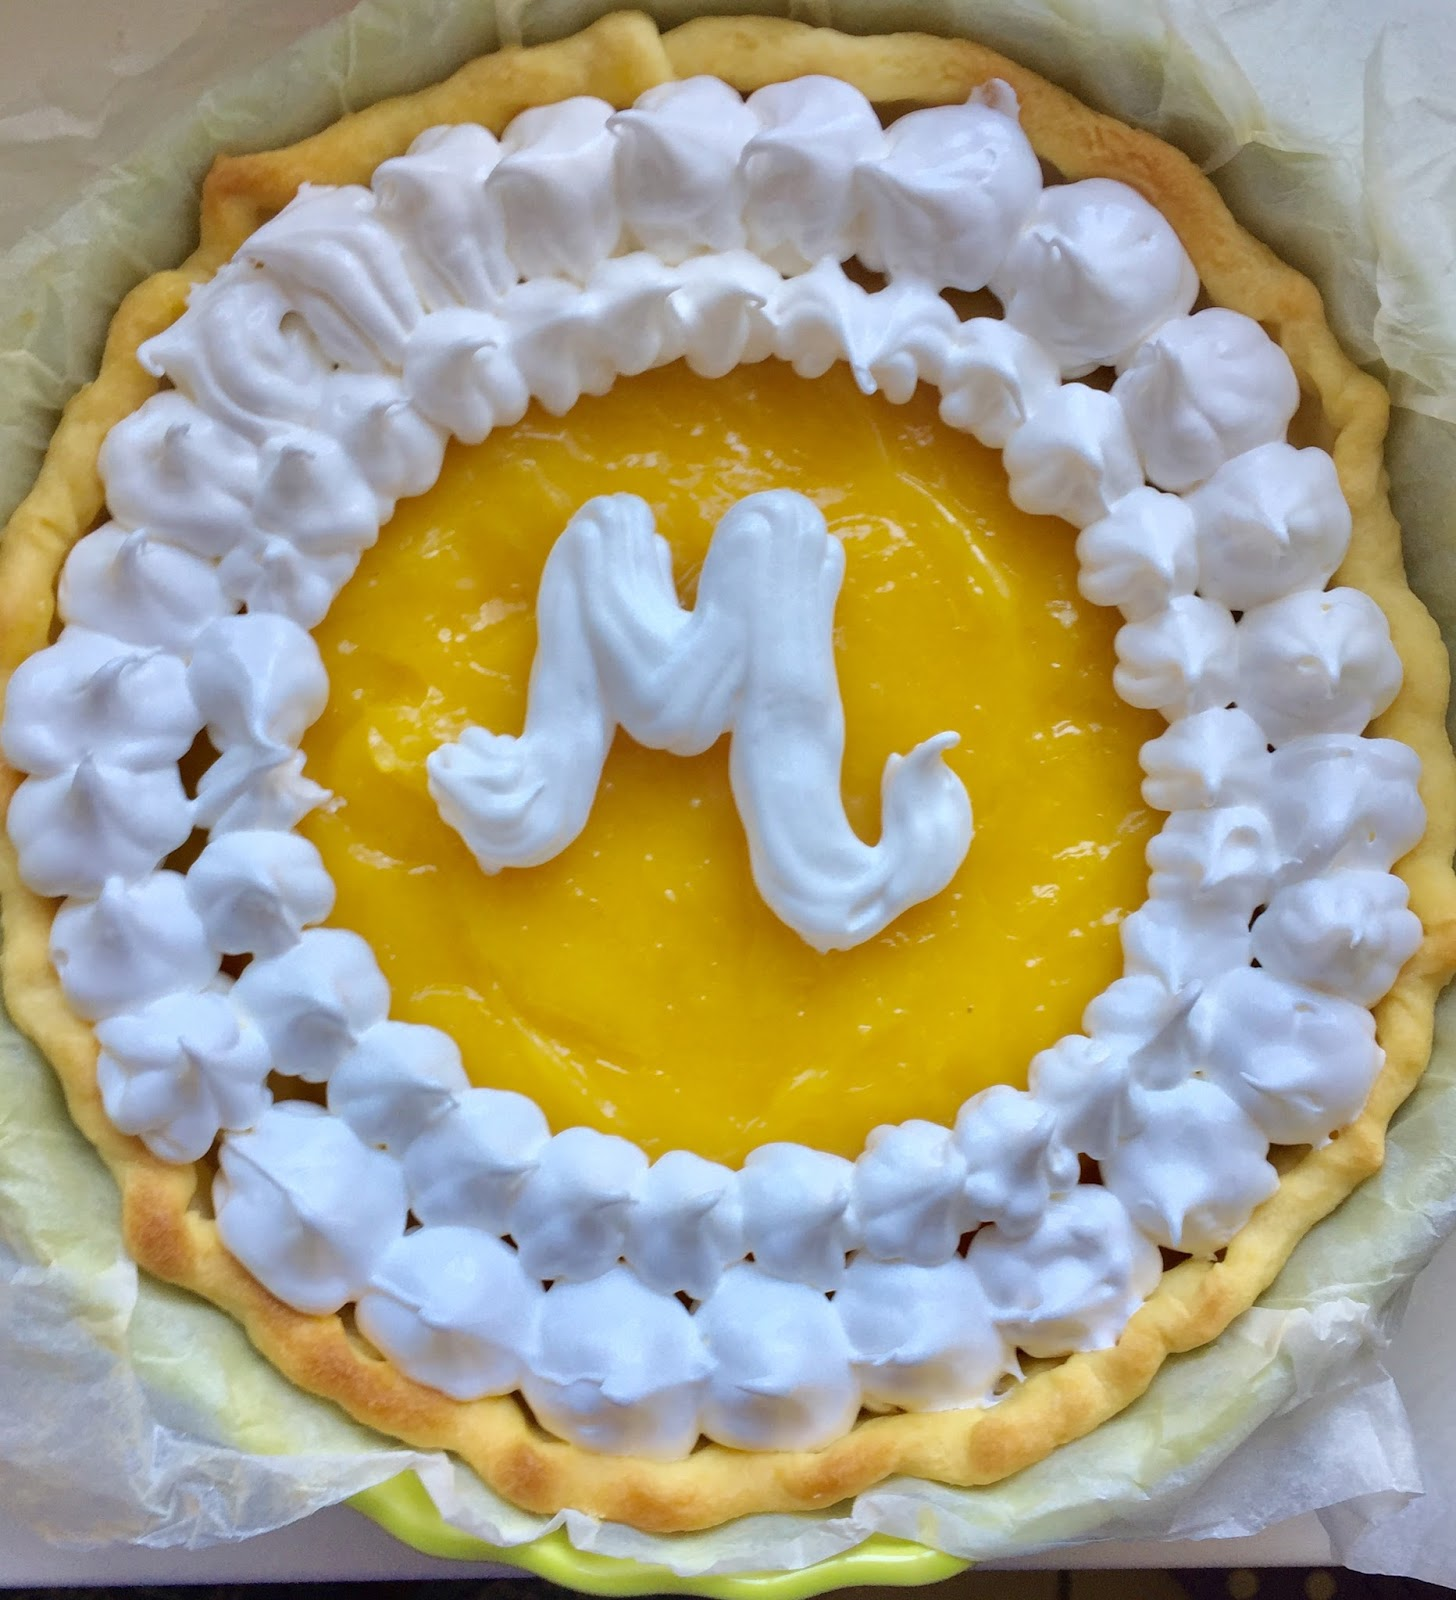 Initiales gg tarte aux citrons meringu e la recette facile - Tarte aux citrons meringuee facile ...